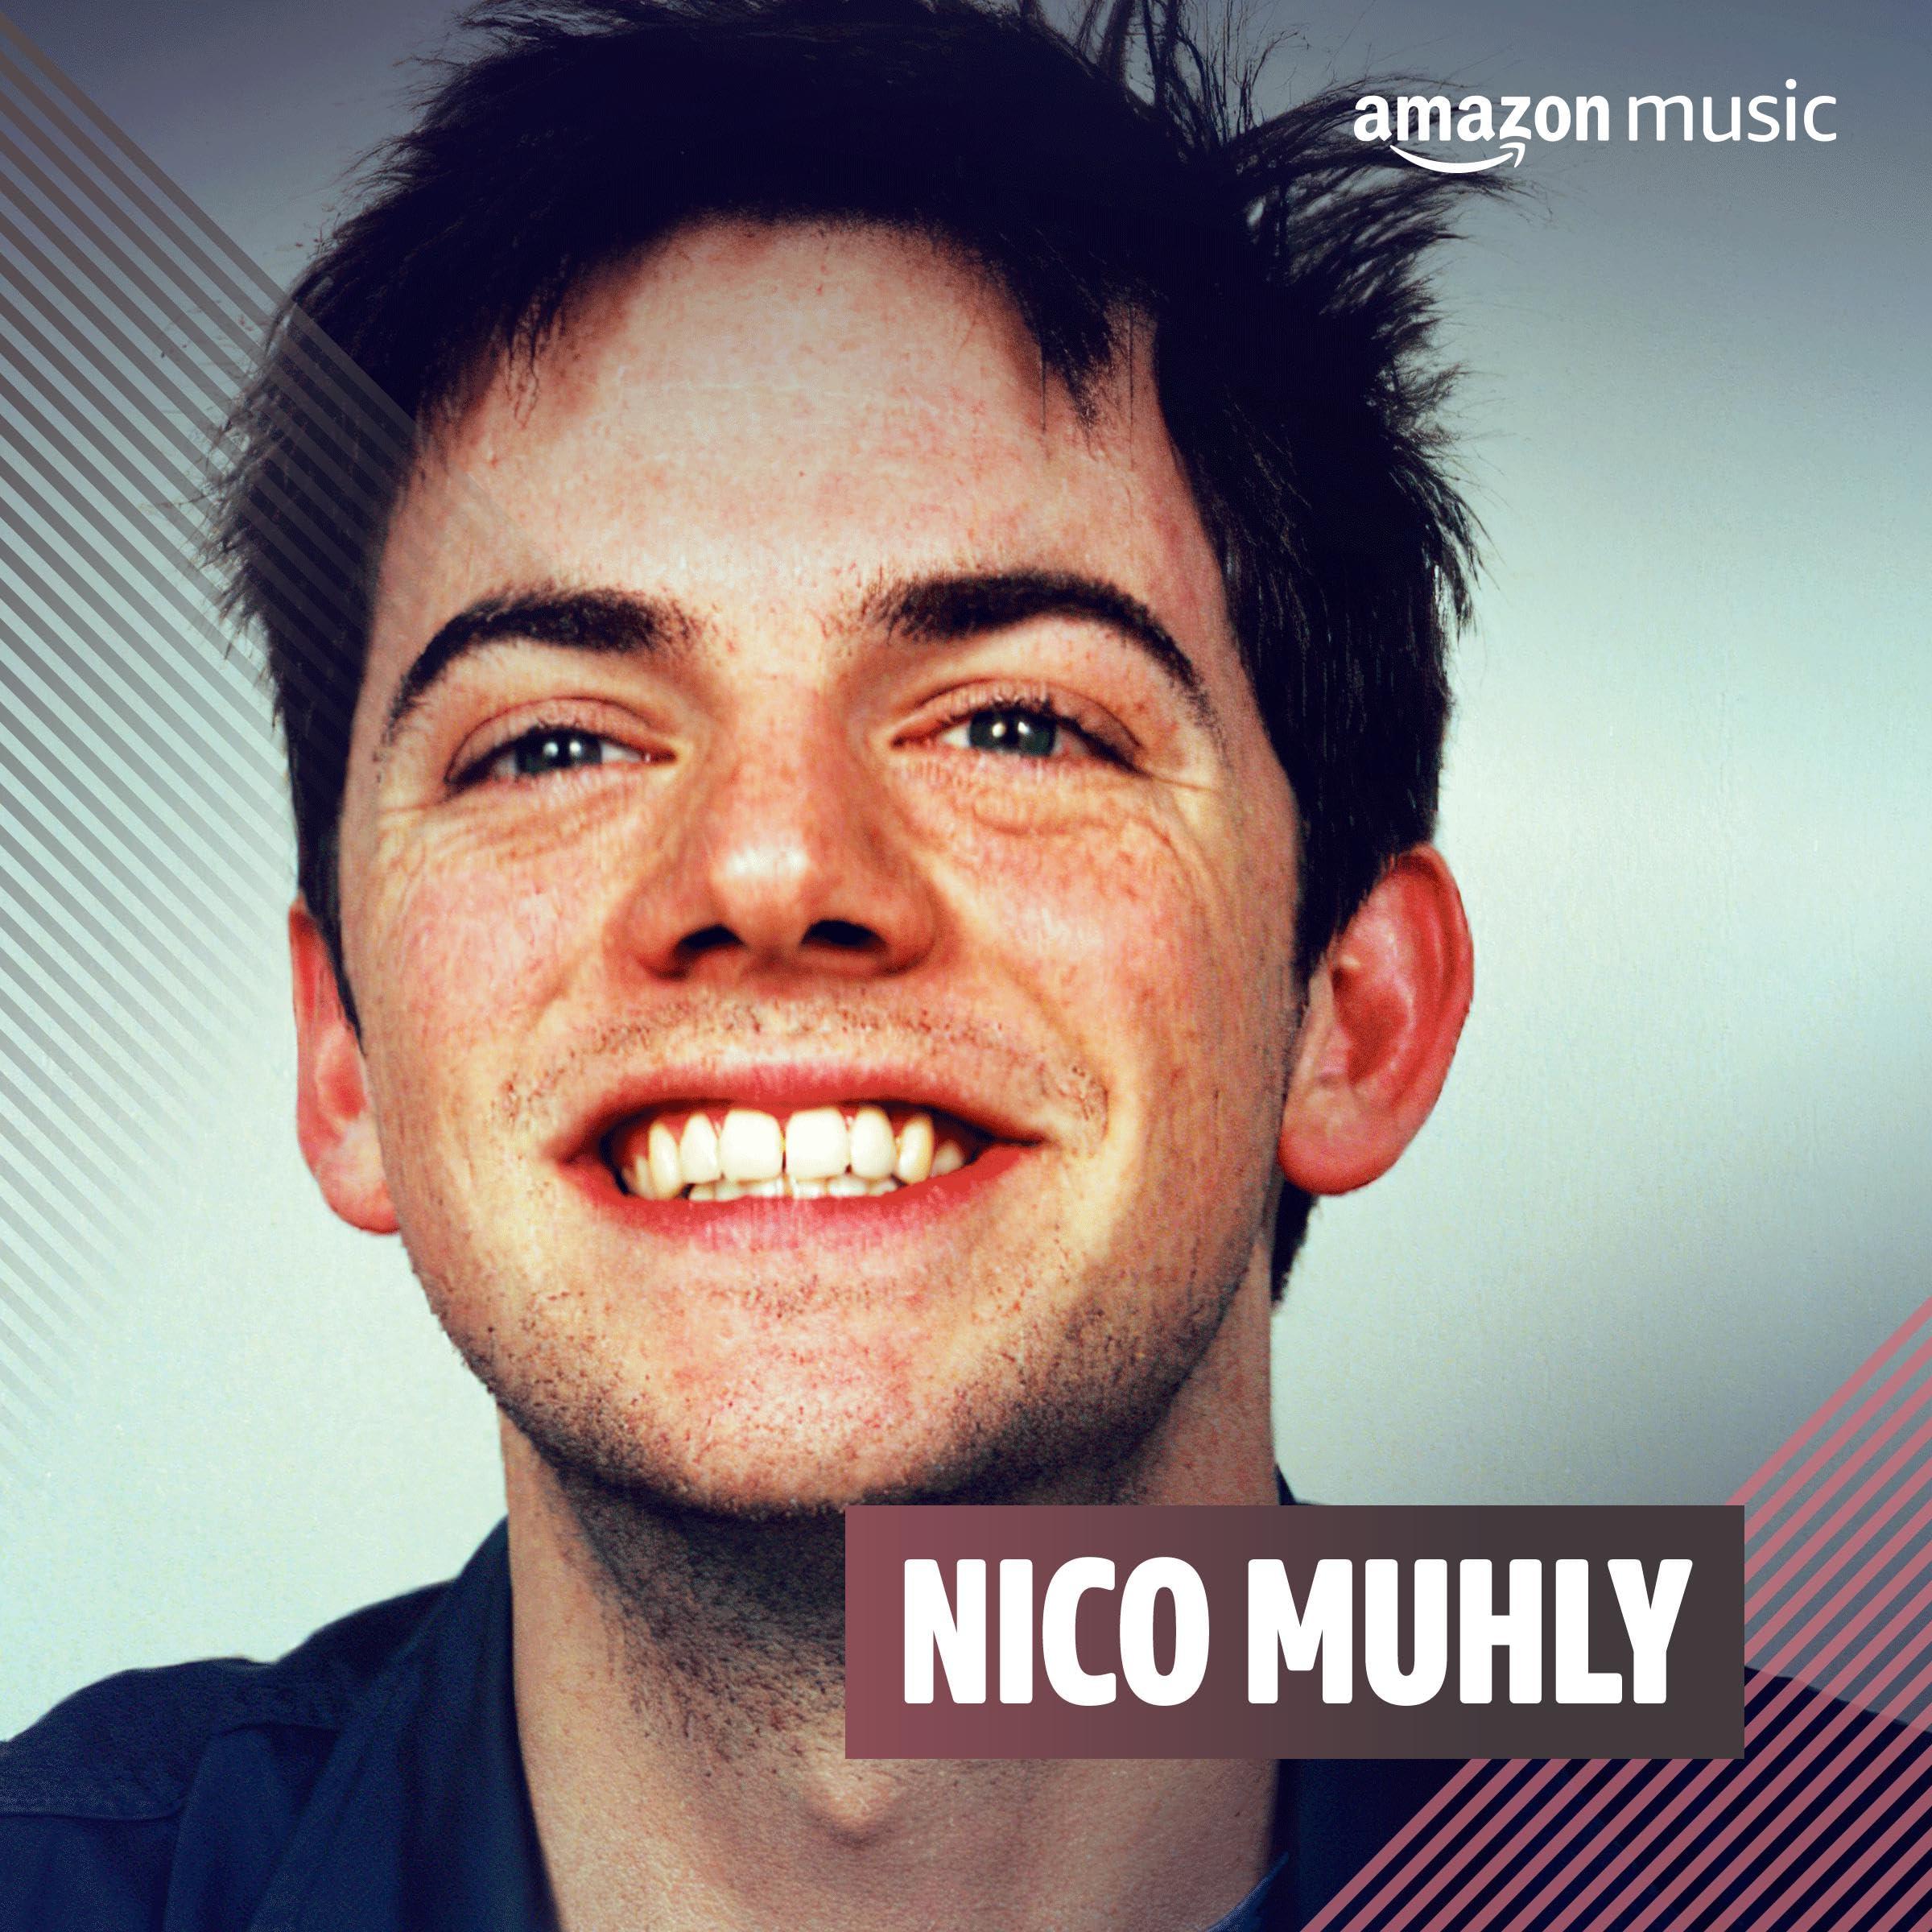 Nico Muhly